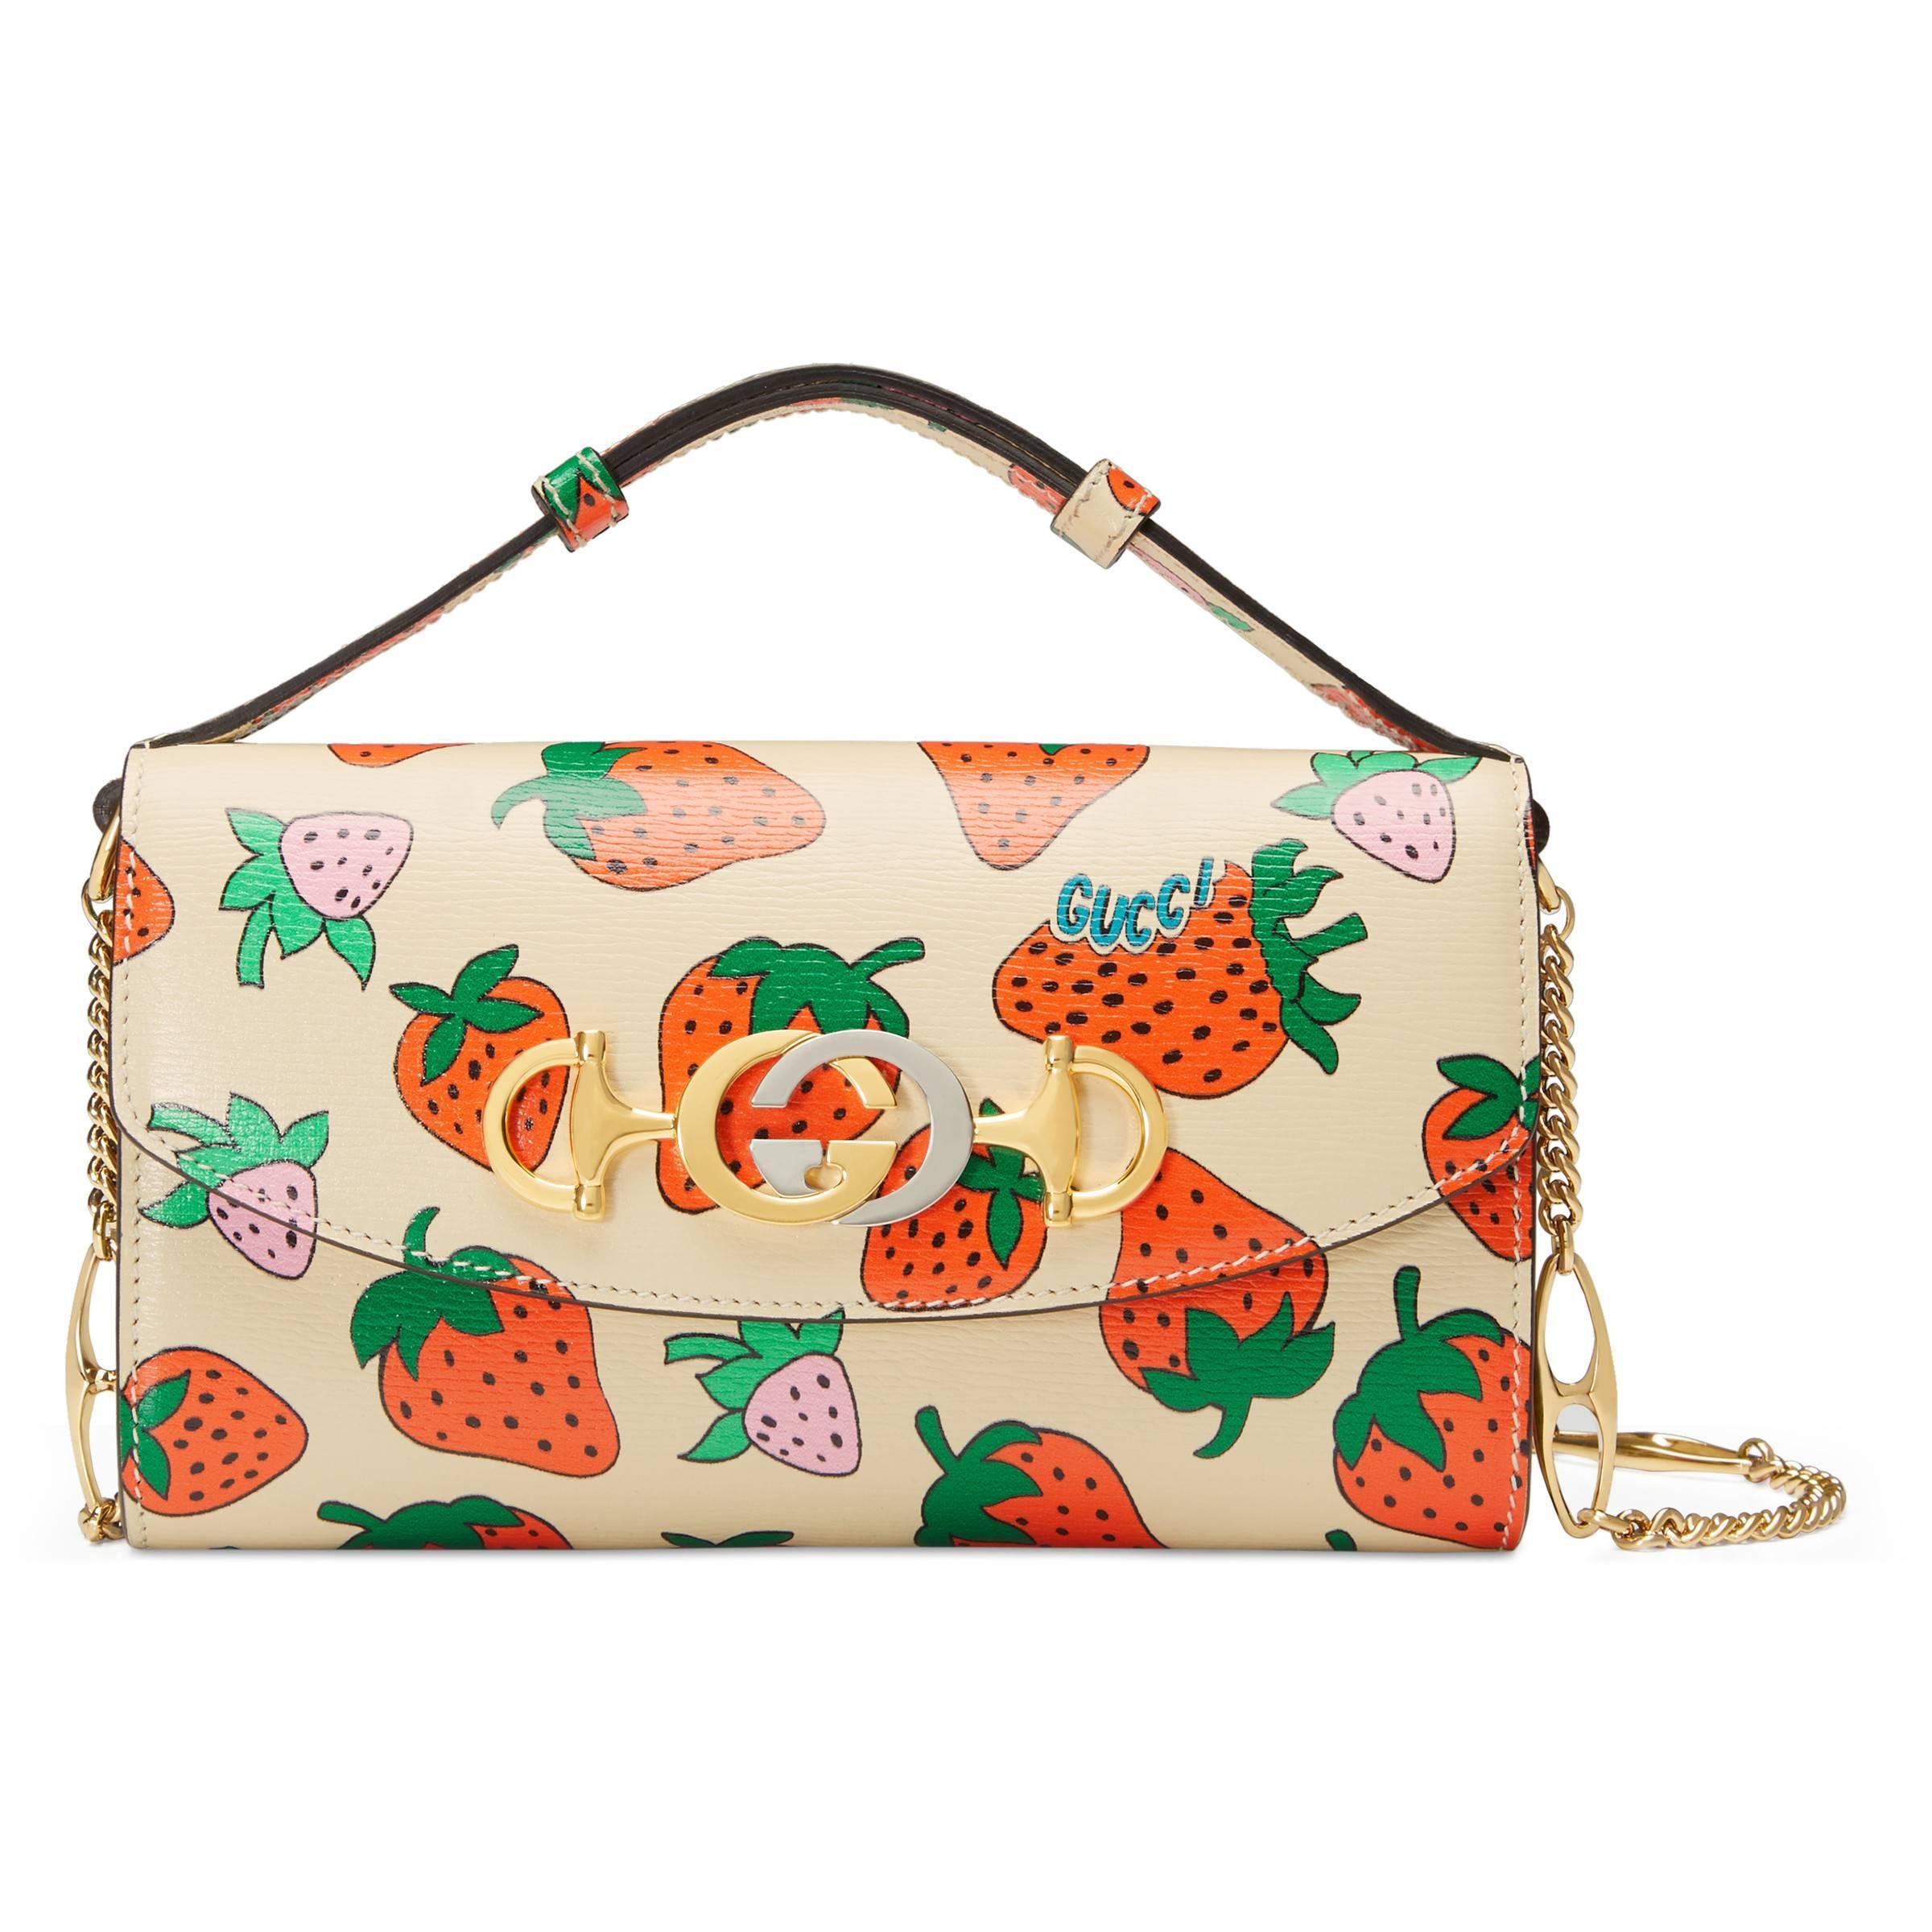 b2c9556fd71 Gucci Zumi Strawberry Print Mini Bag in White - Lyst